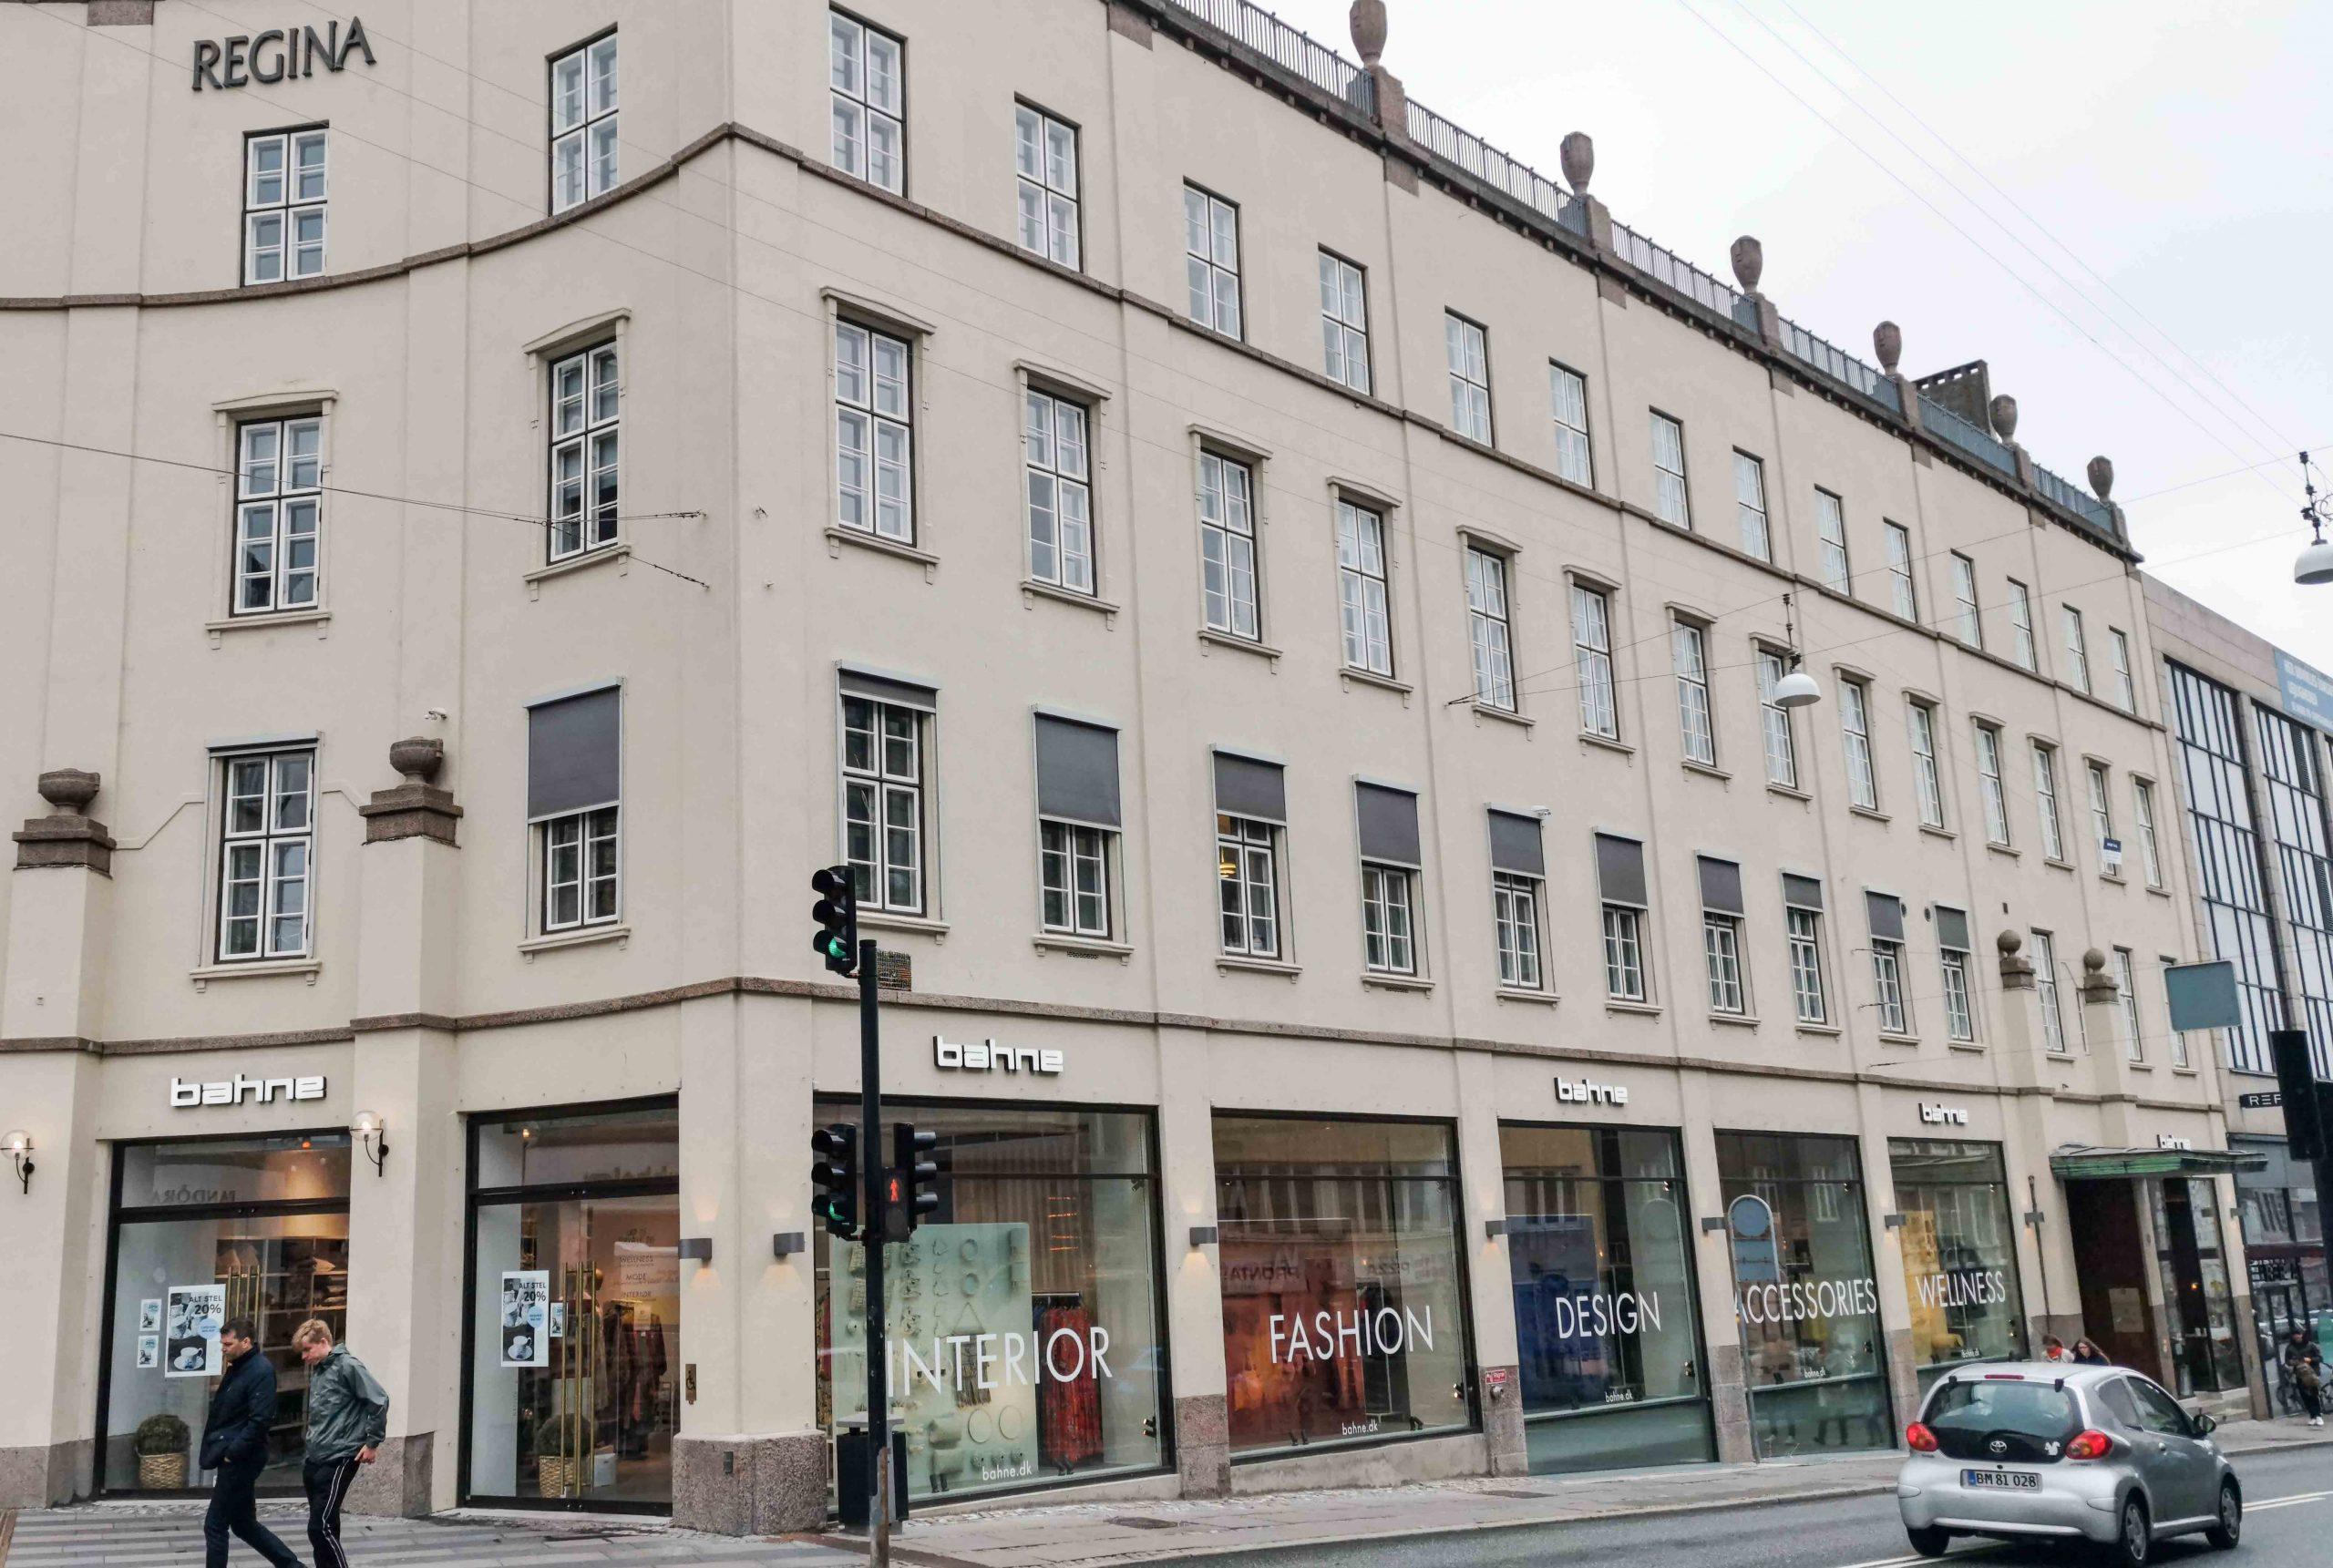 Coffee Ten kommer til Aarhus: Bahne i Regina udvider med prisvenlig kaffebar